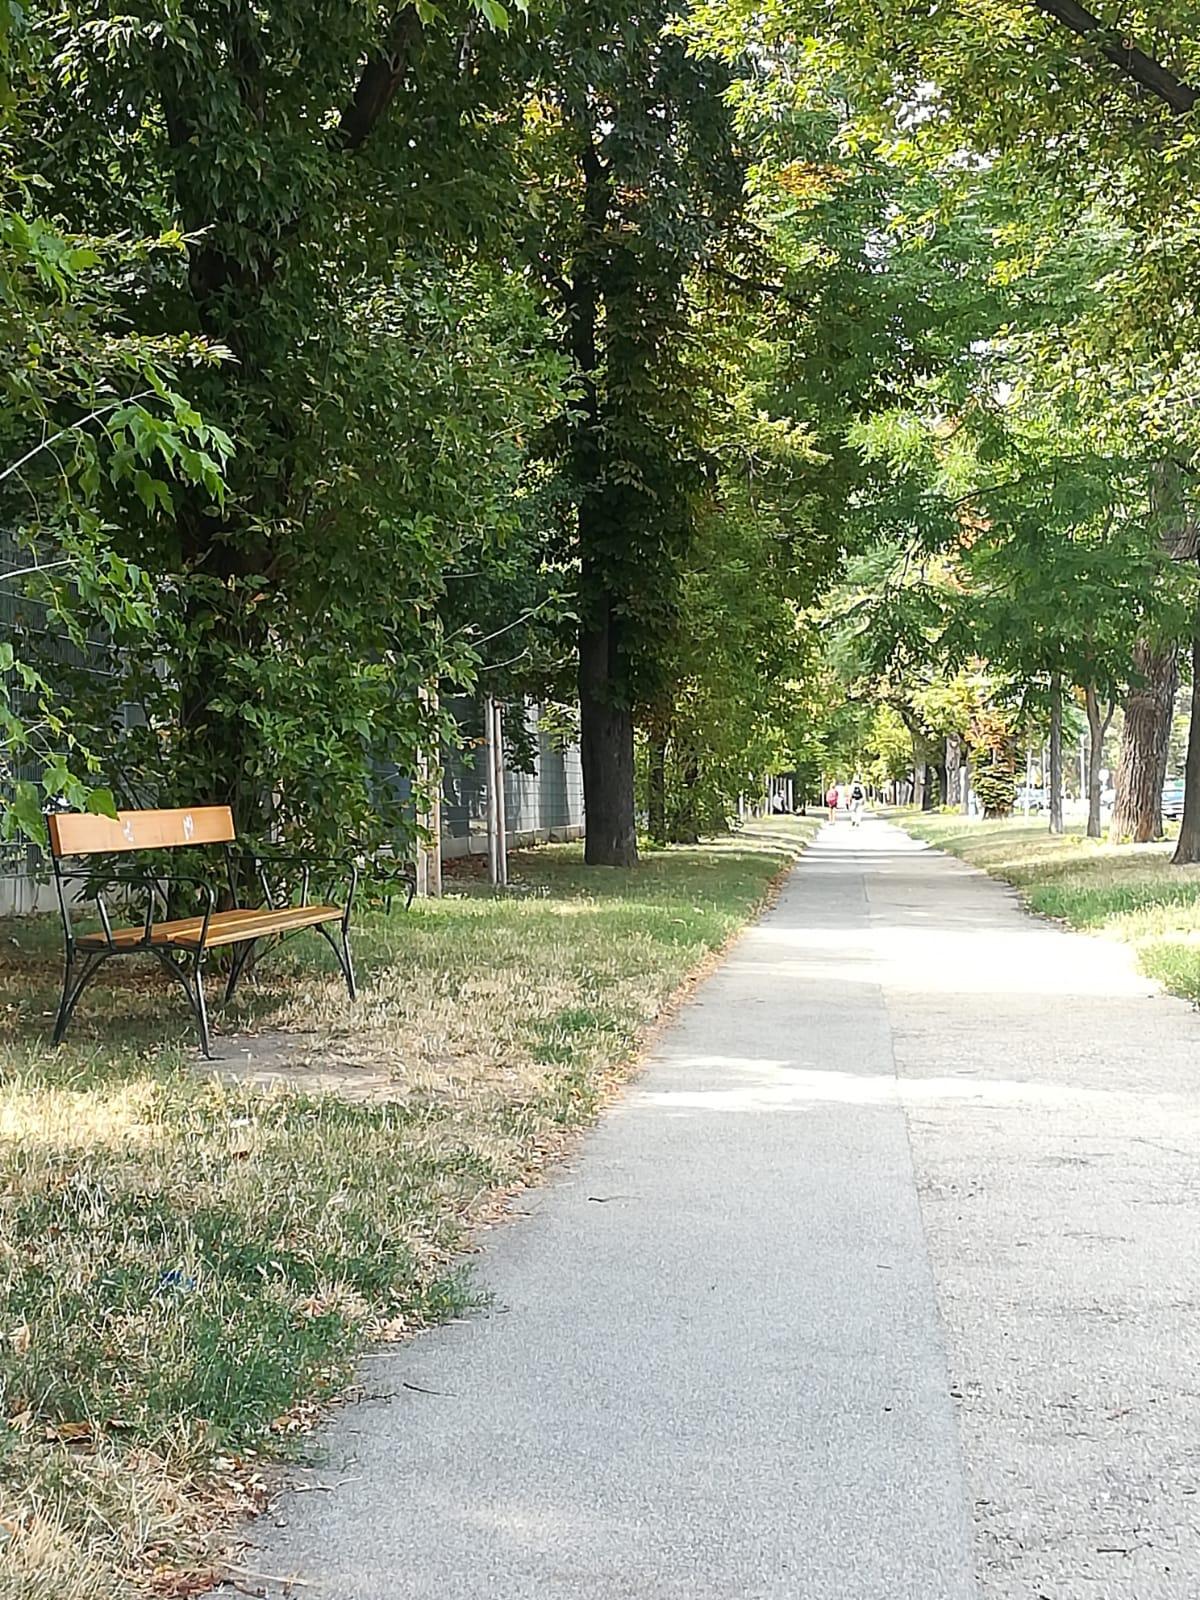 Peaceful path through trees